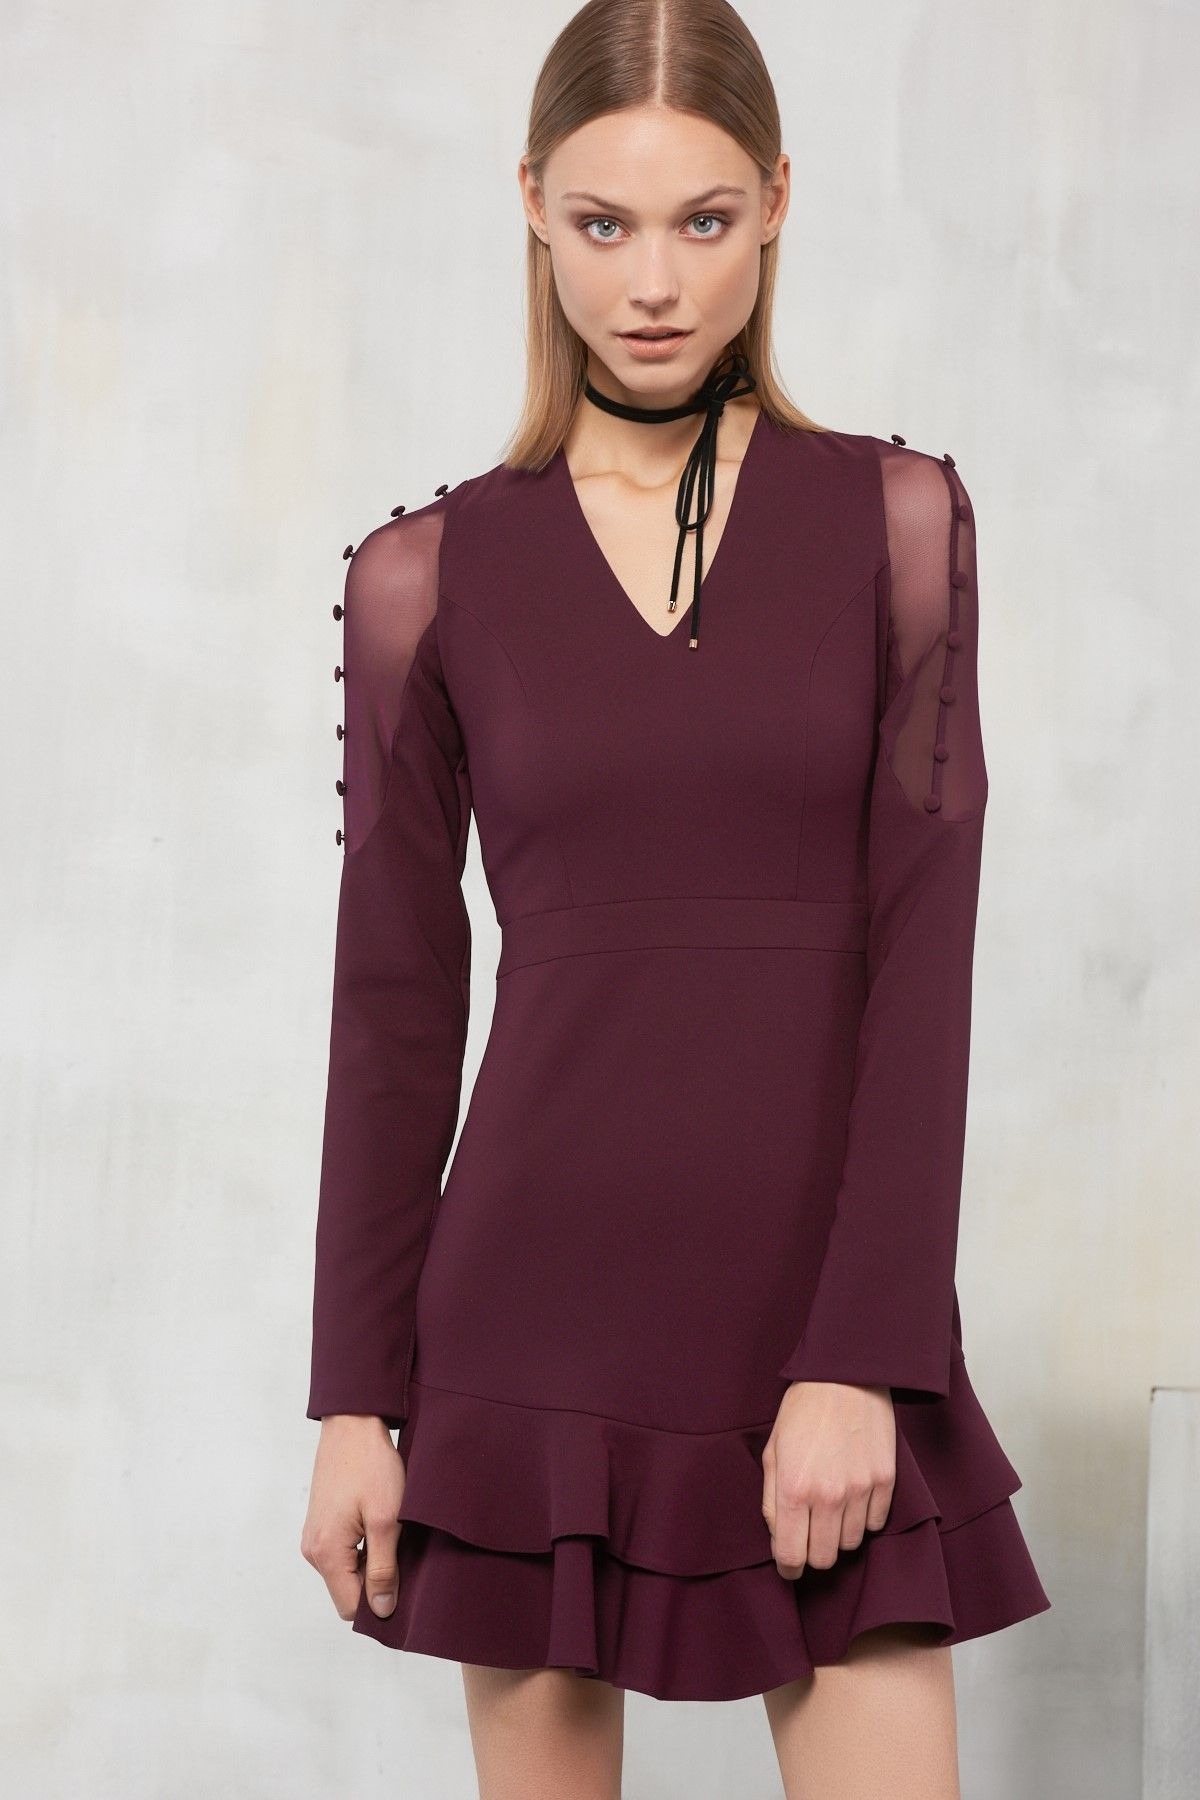 295b23ae207cd Mürdüm Kolları Düğme Detaylı Elbise TRENDYOLMİLLA   Trendyol   cloth ...